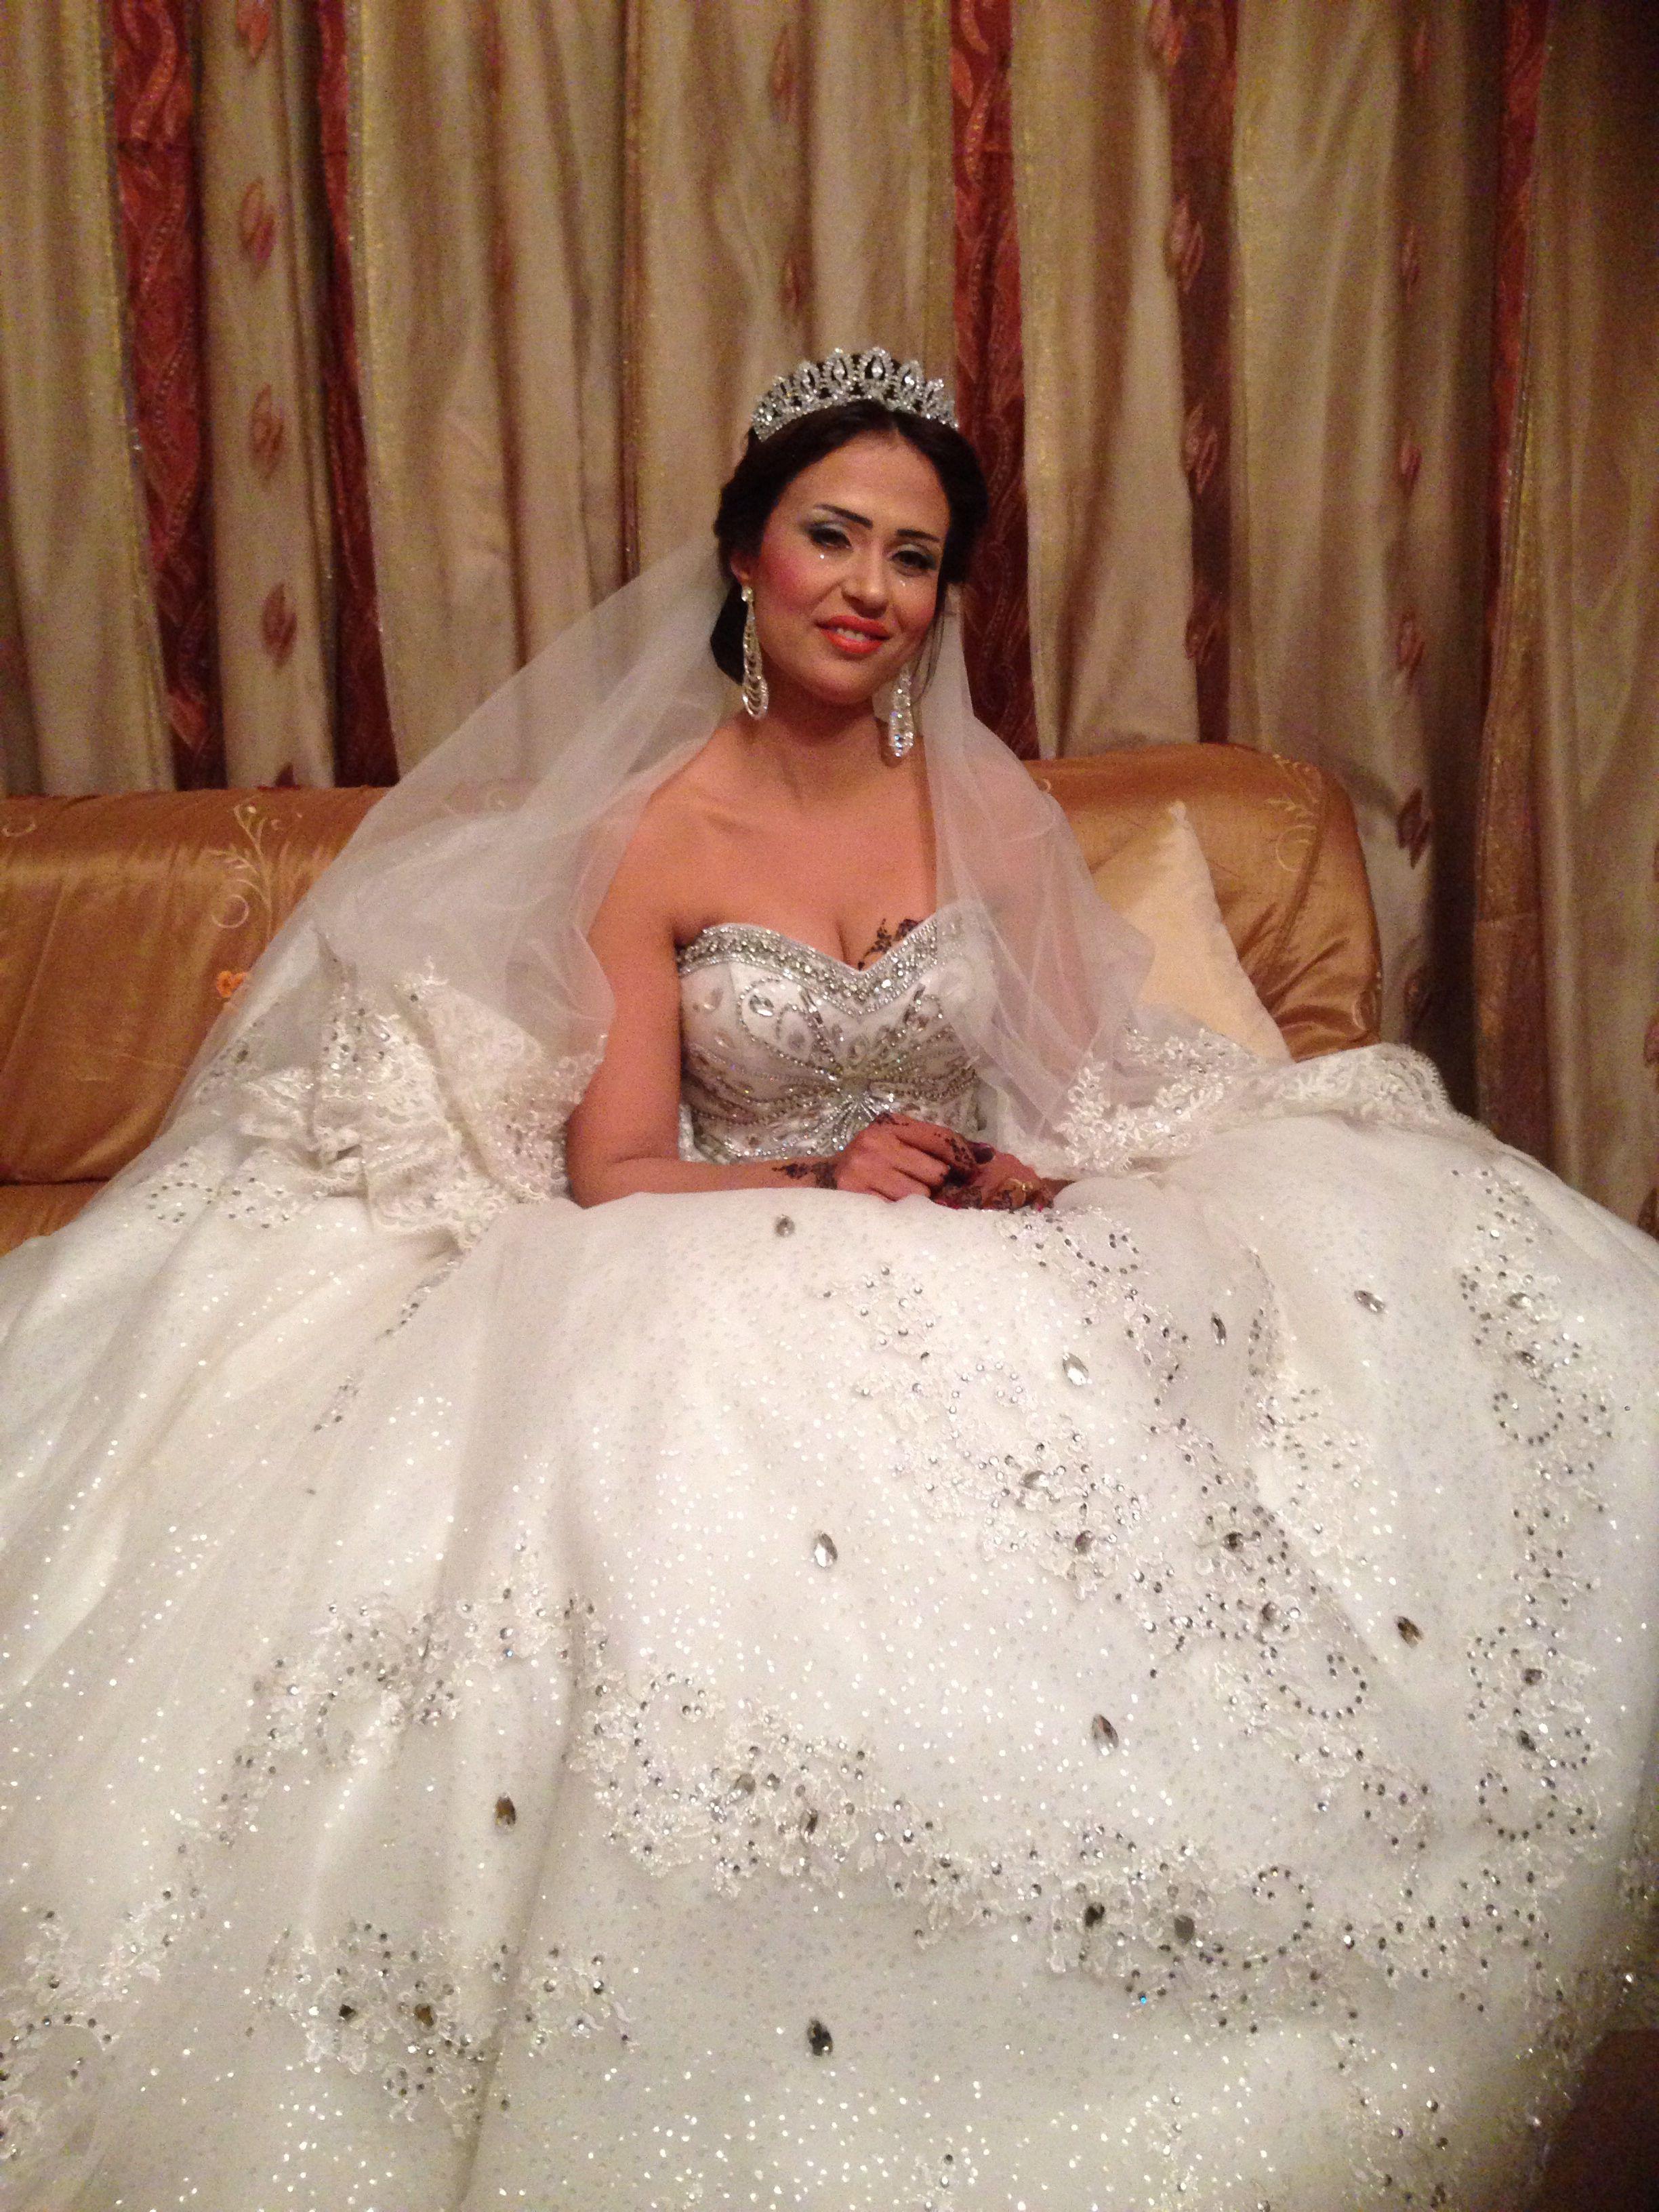 Traditional tunisian wedding dress  Tunisian Bride  Tunisian Wedding  Tunisia  TUNISIA  my country